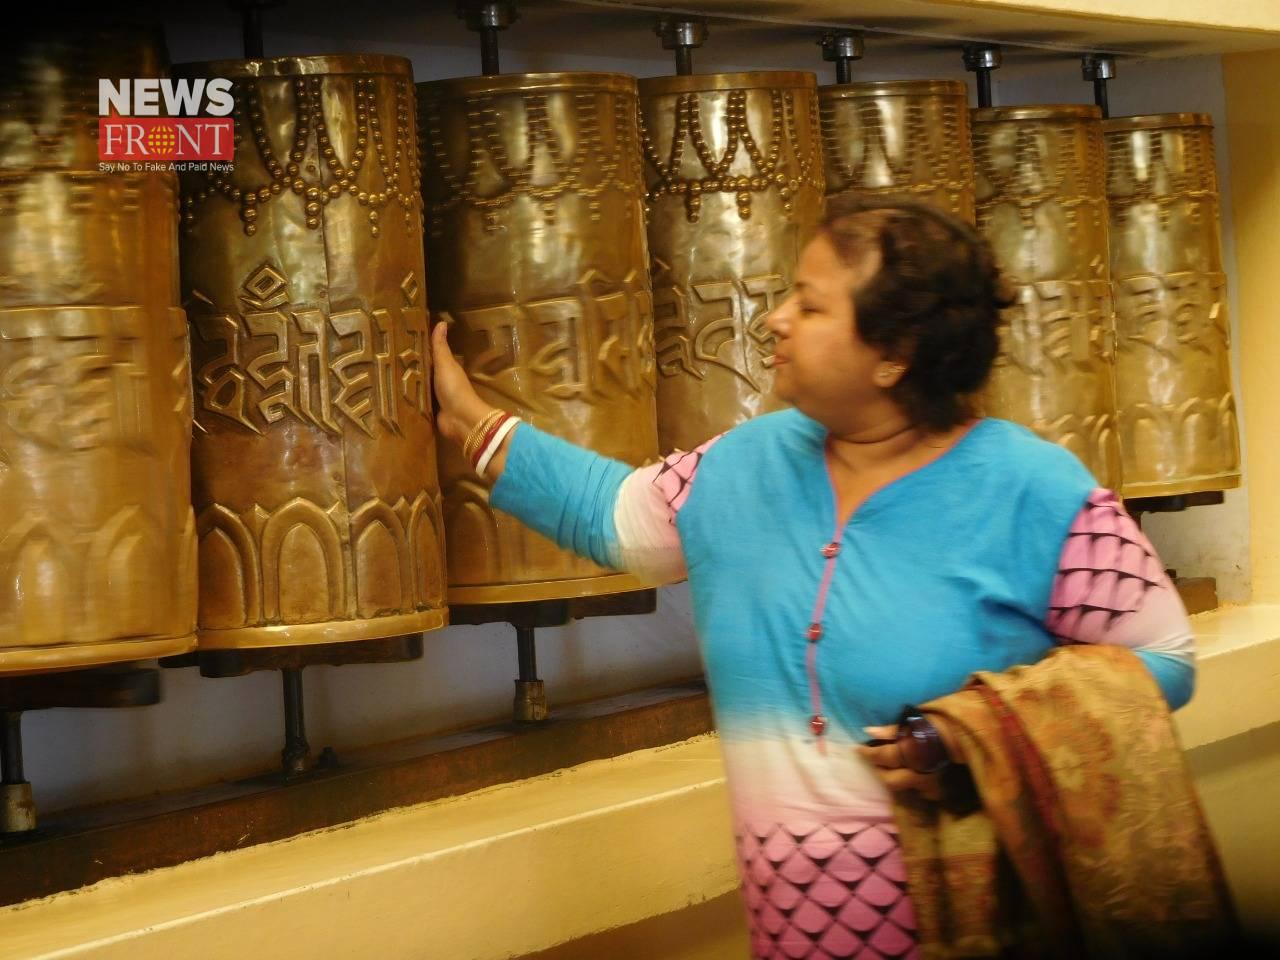 Boudhha temple | newsfront.co